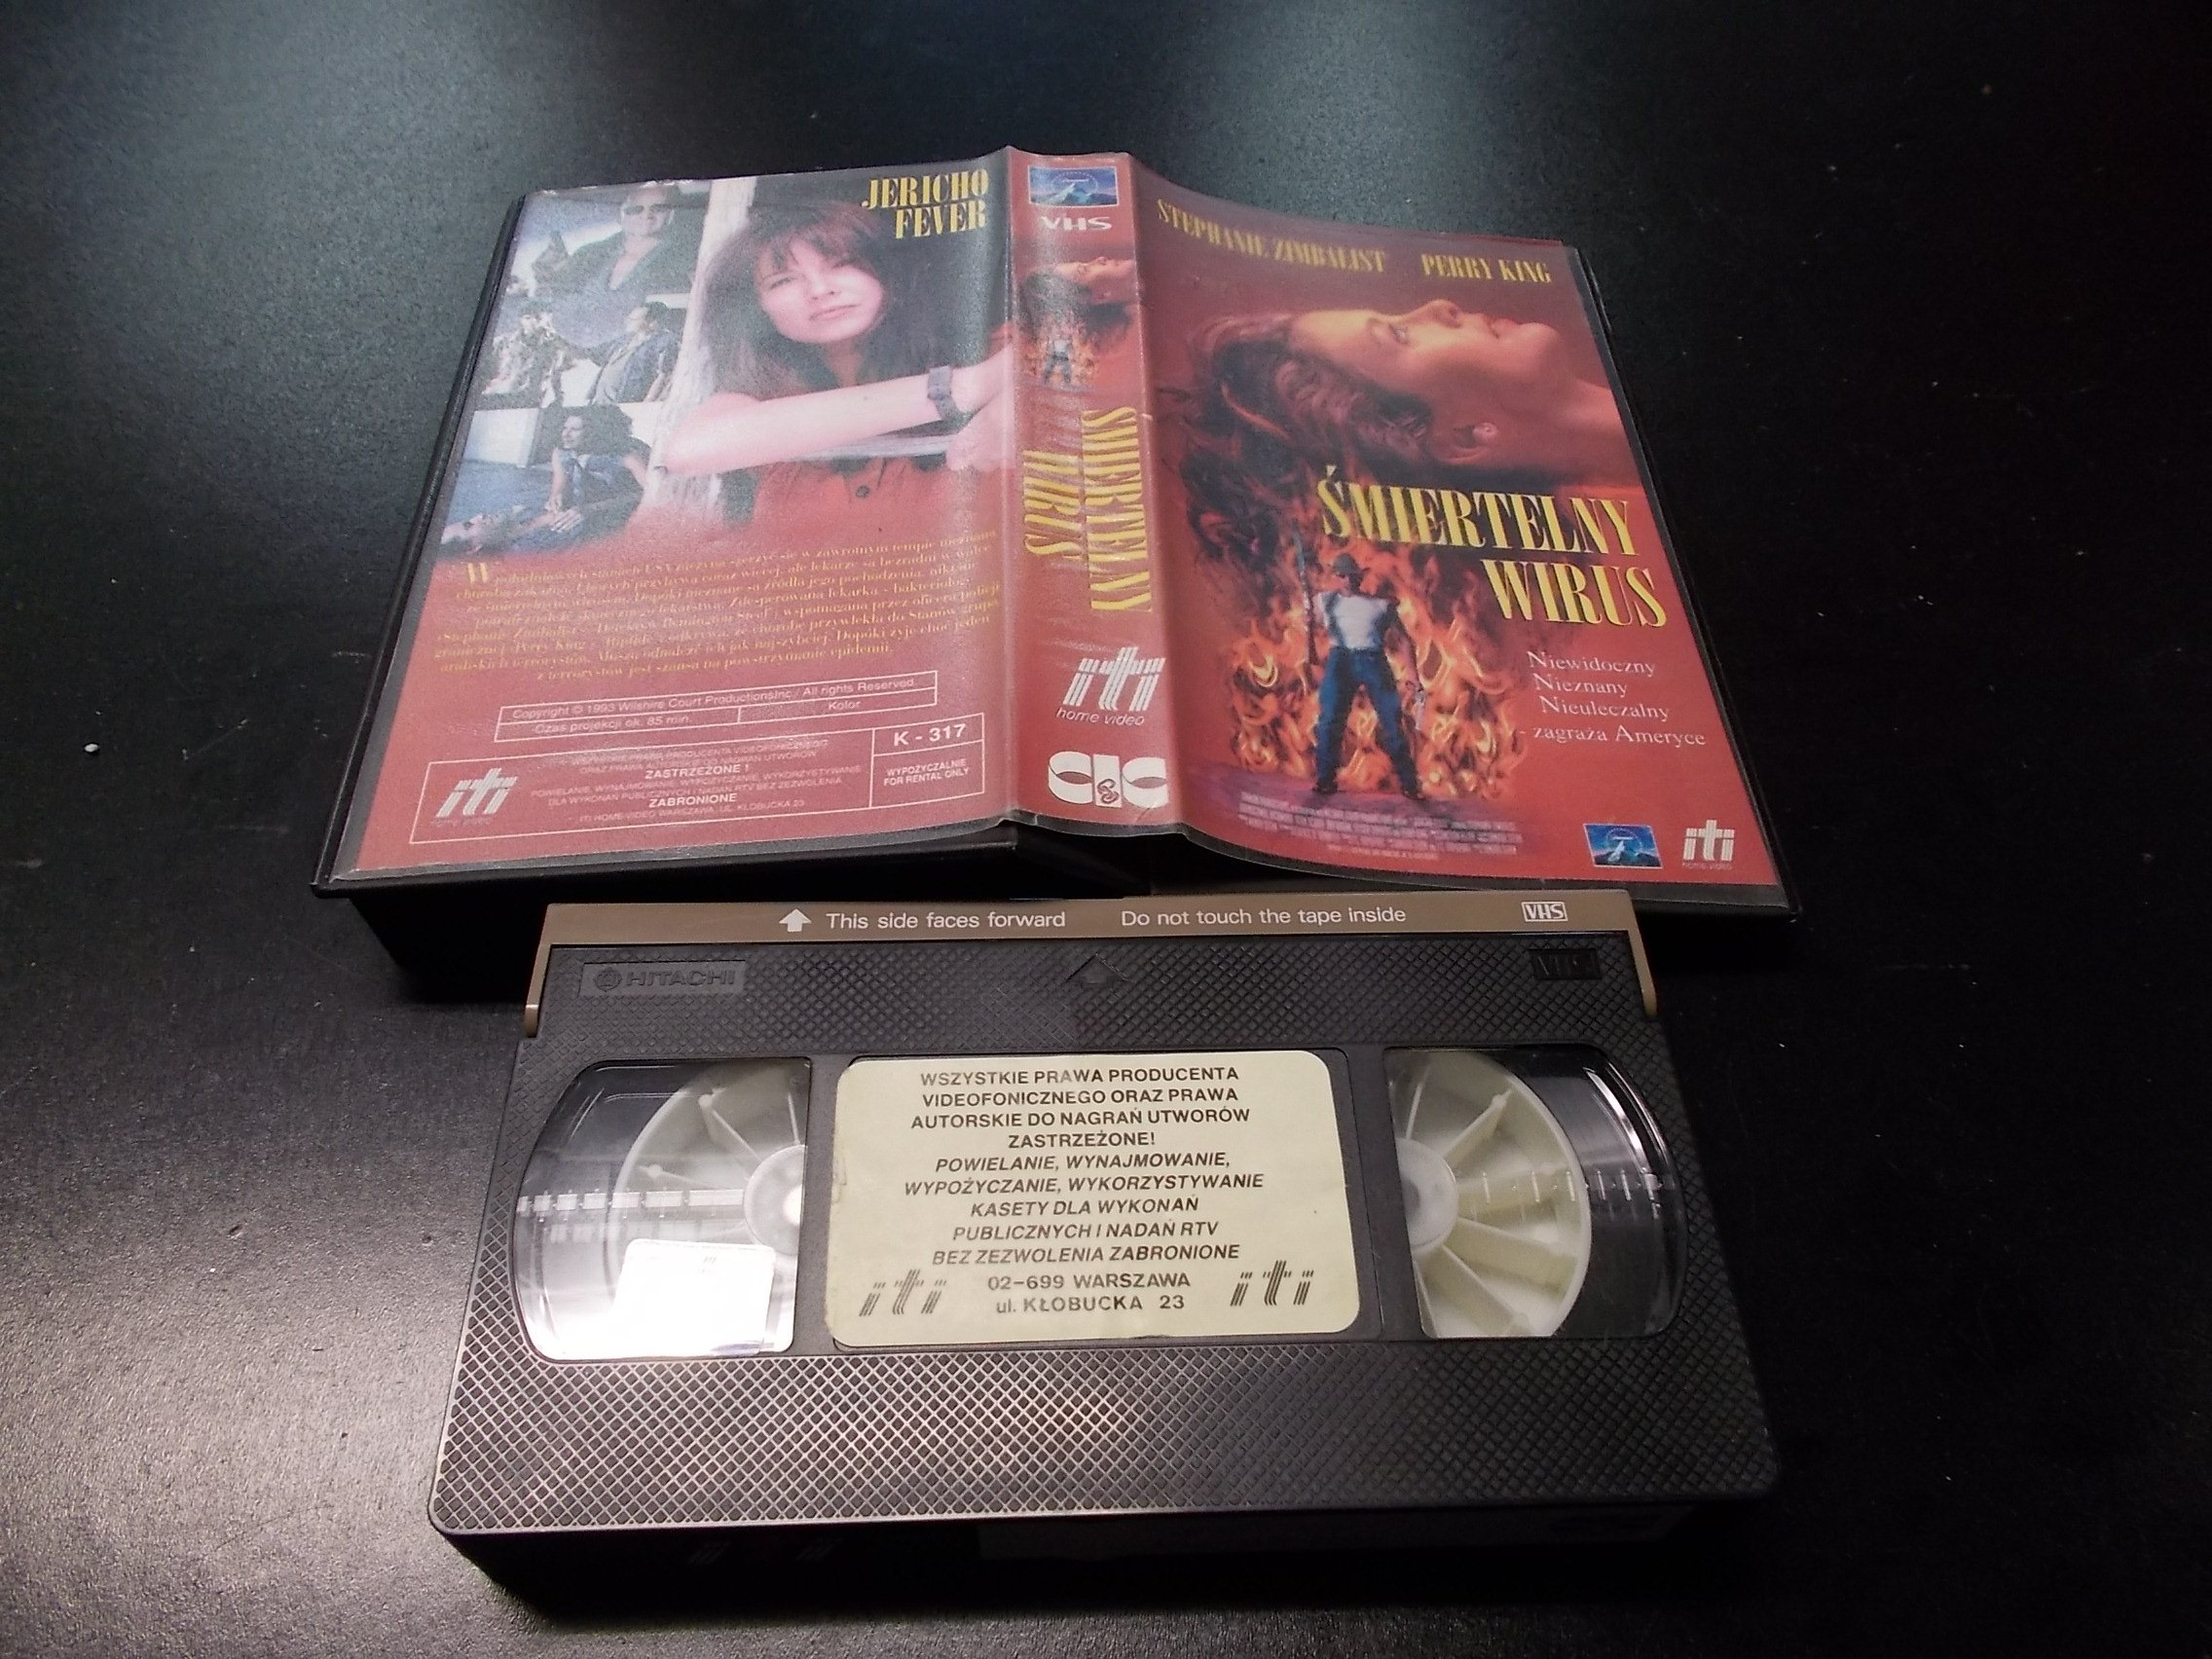 ŚMIERTELNY WIRUS -  kaseta VHS - 1235 Opole - AlleOpole.pl